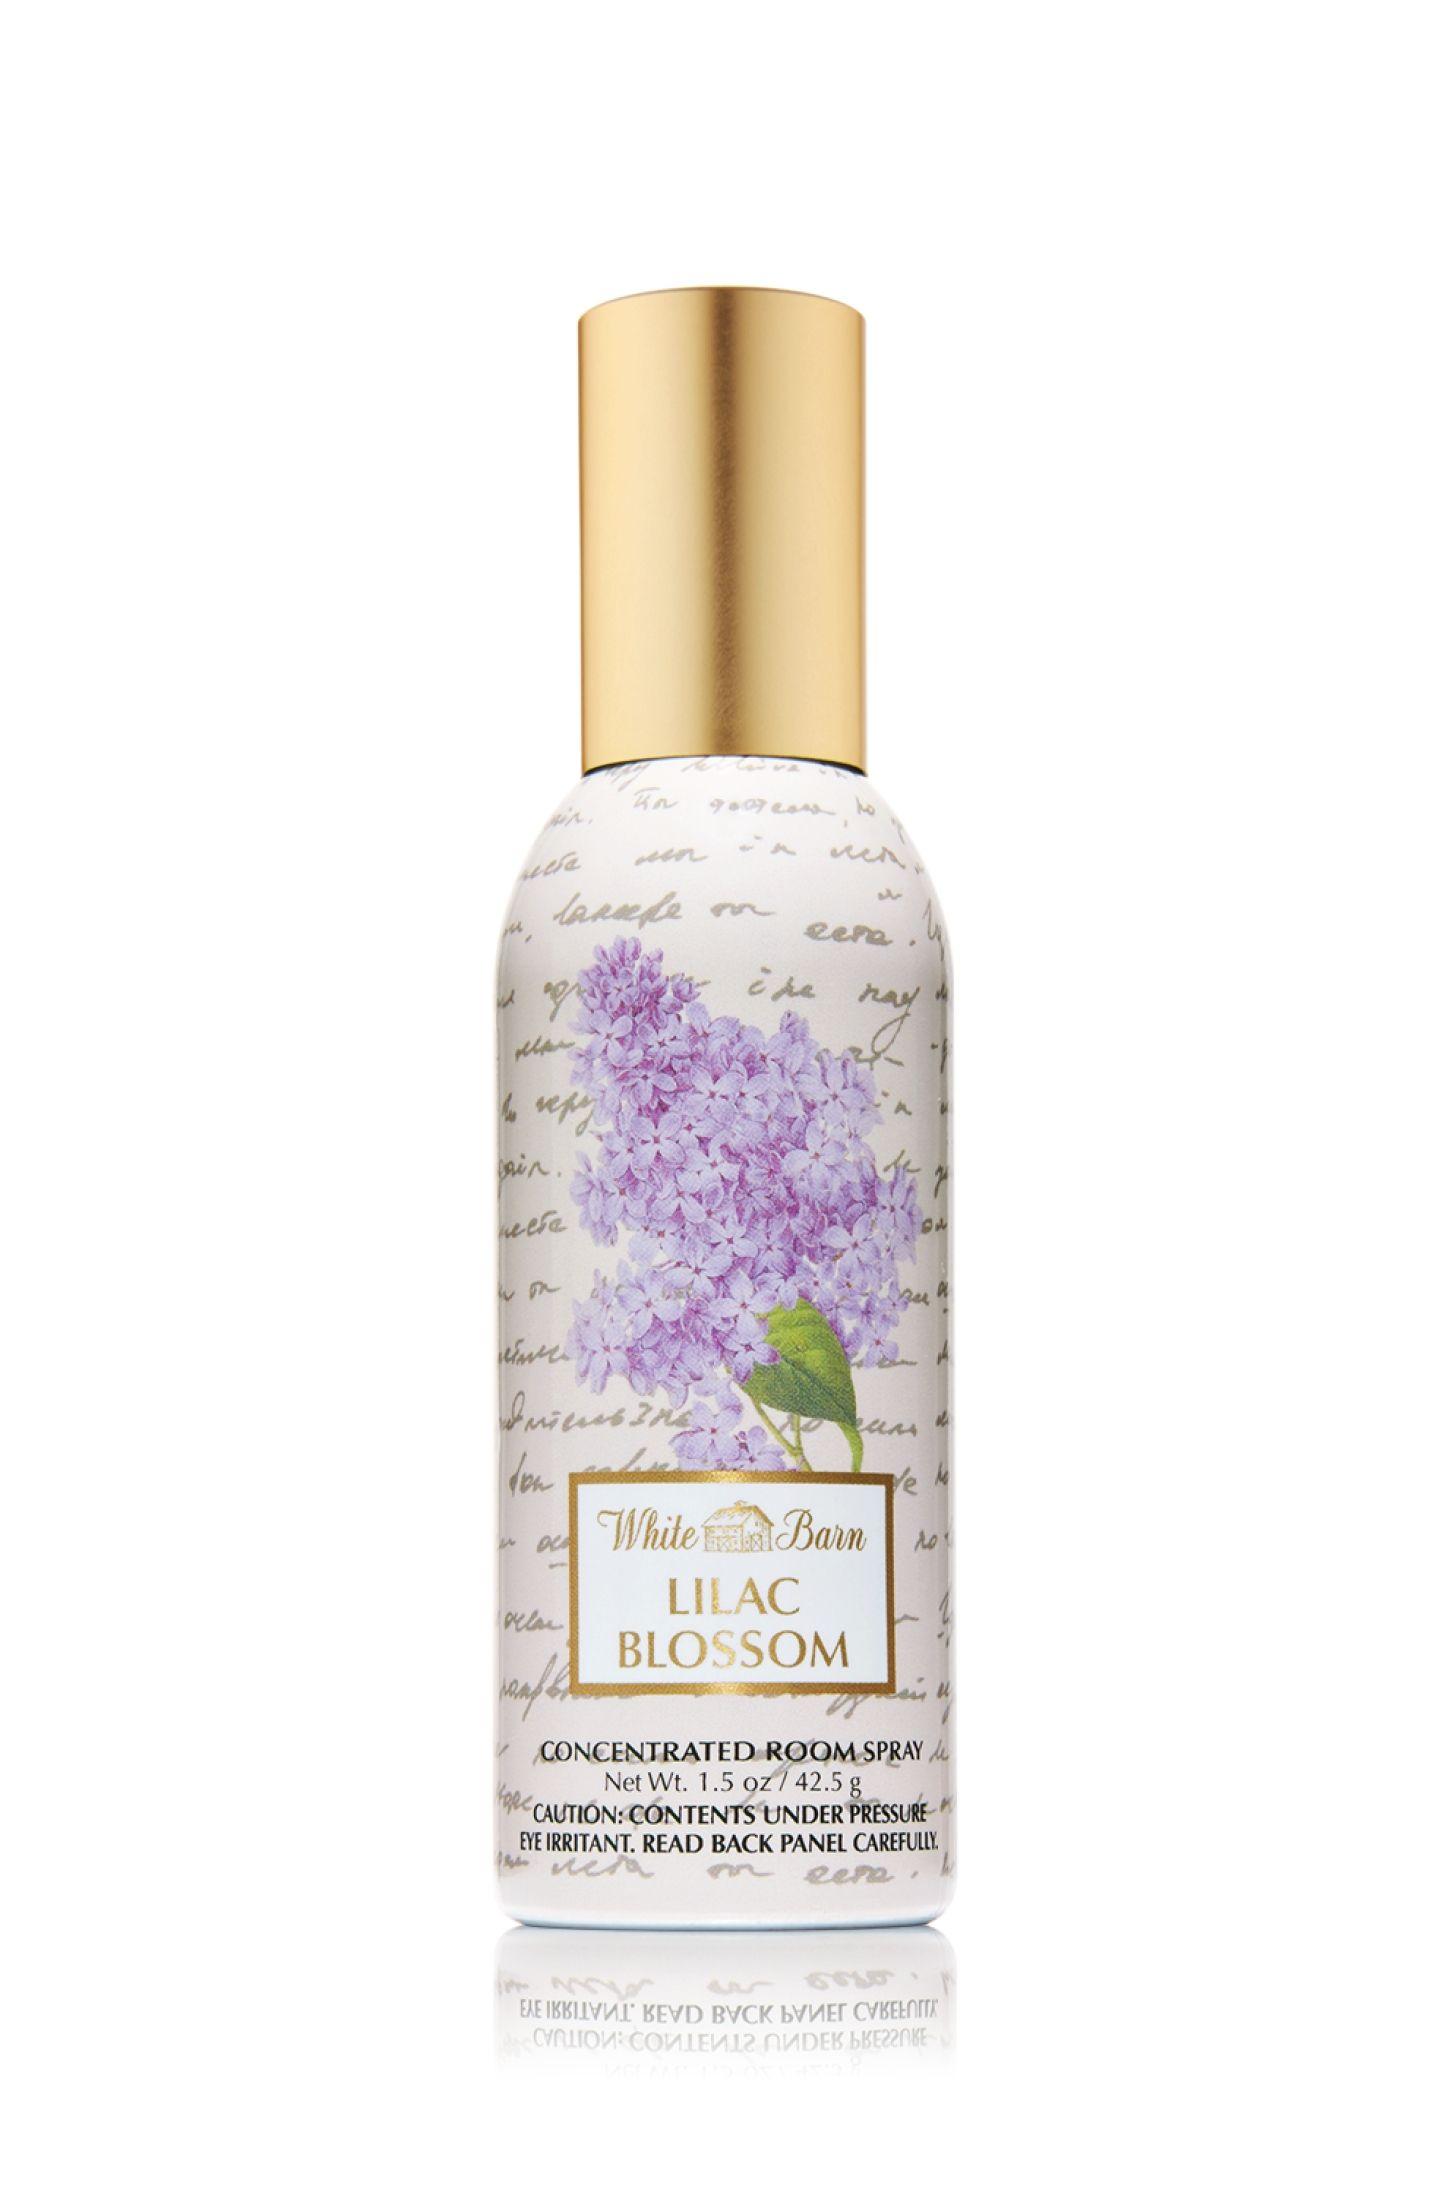 Lilac Blossom Concentrated Room Spray Slatkin Co Bath Body Works Bath And Body Works Room Spray Bath And Body